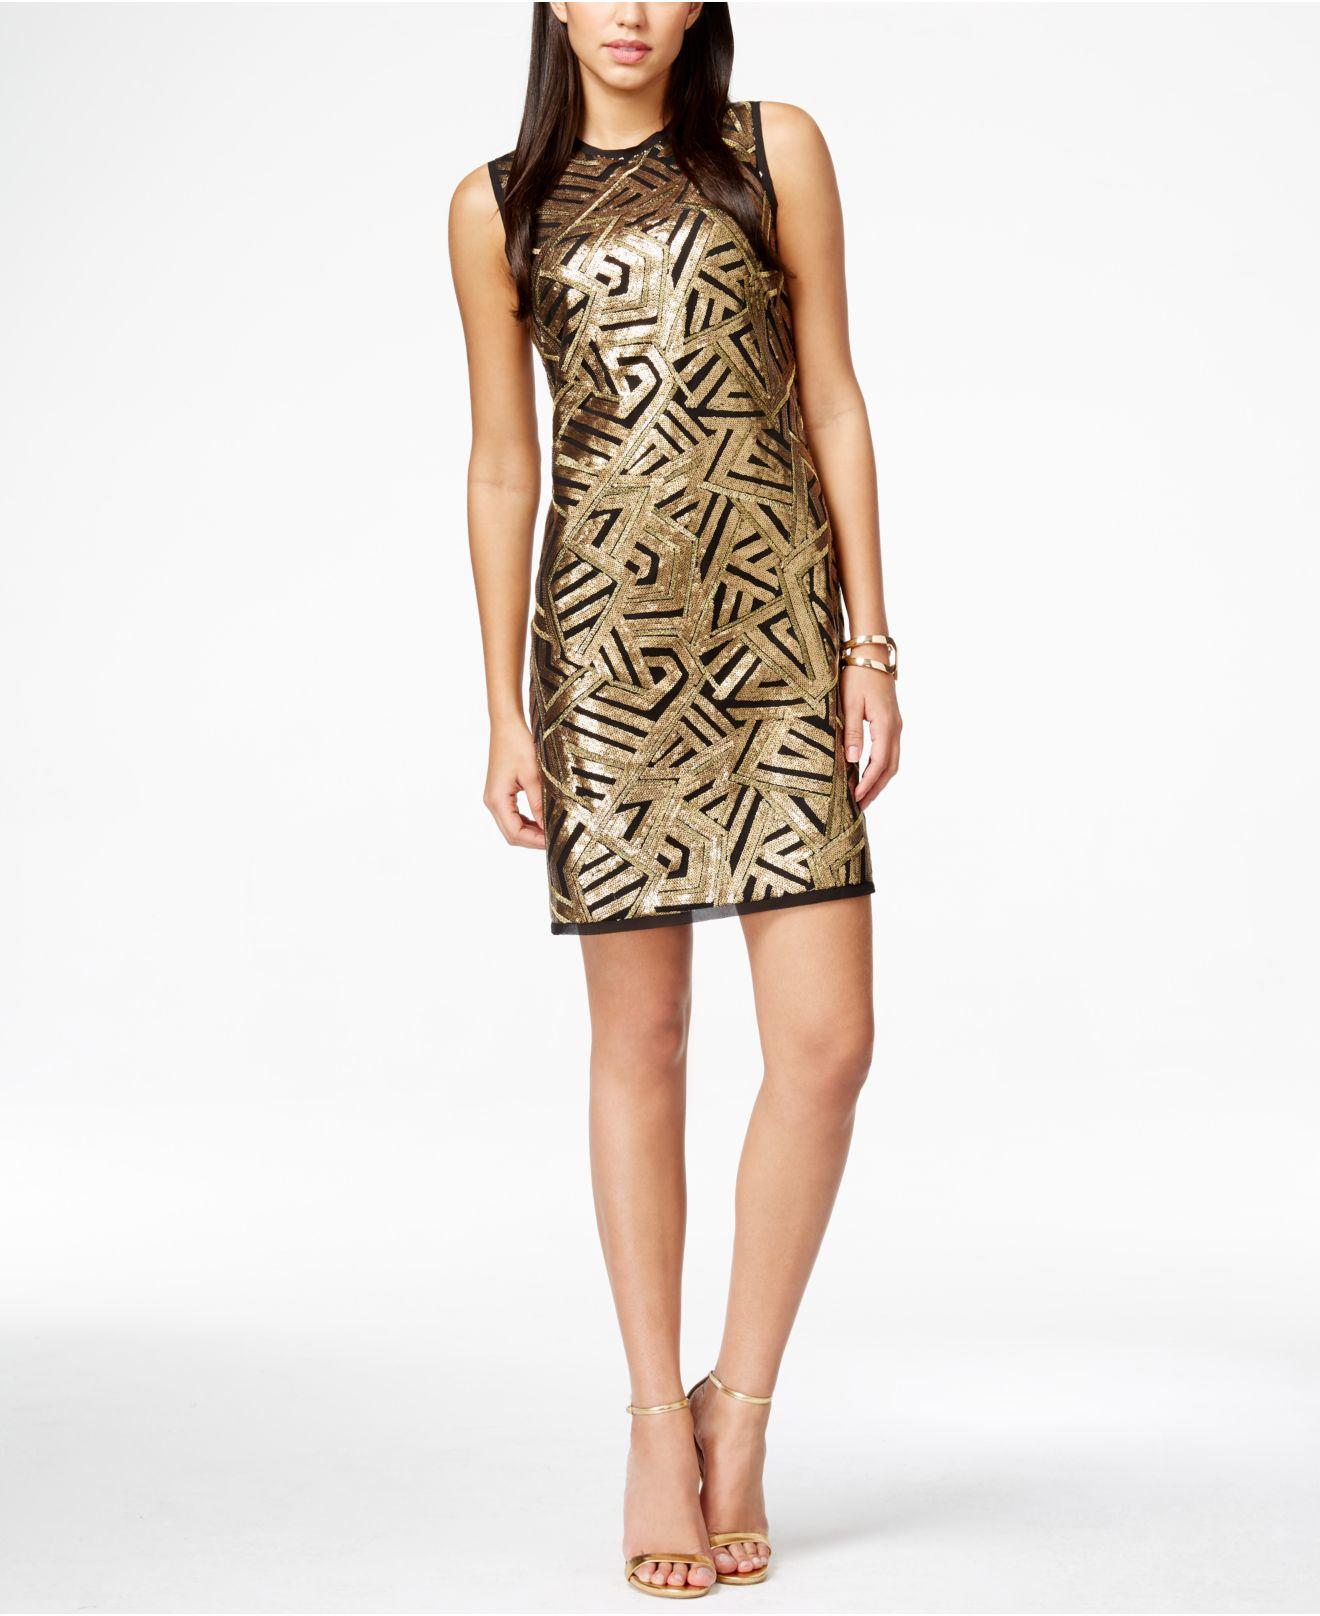 Online vince bodycon camuto sequin dress metallic brands highlands